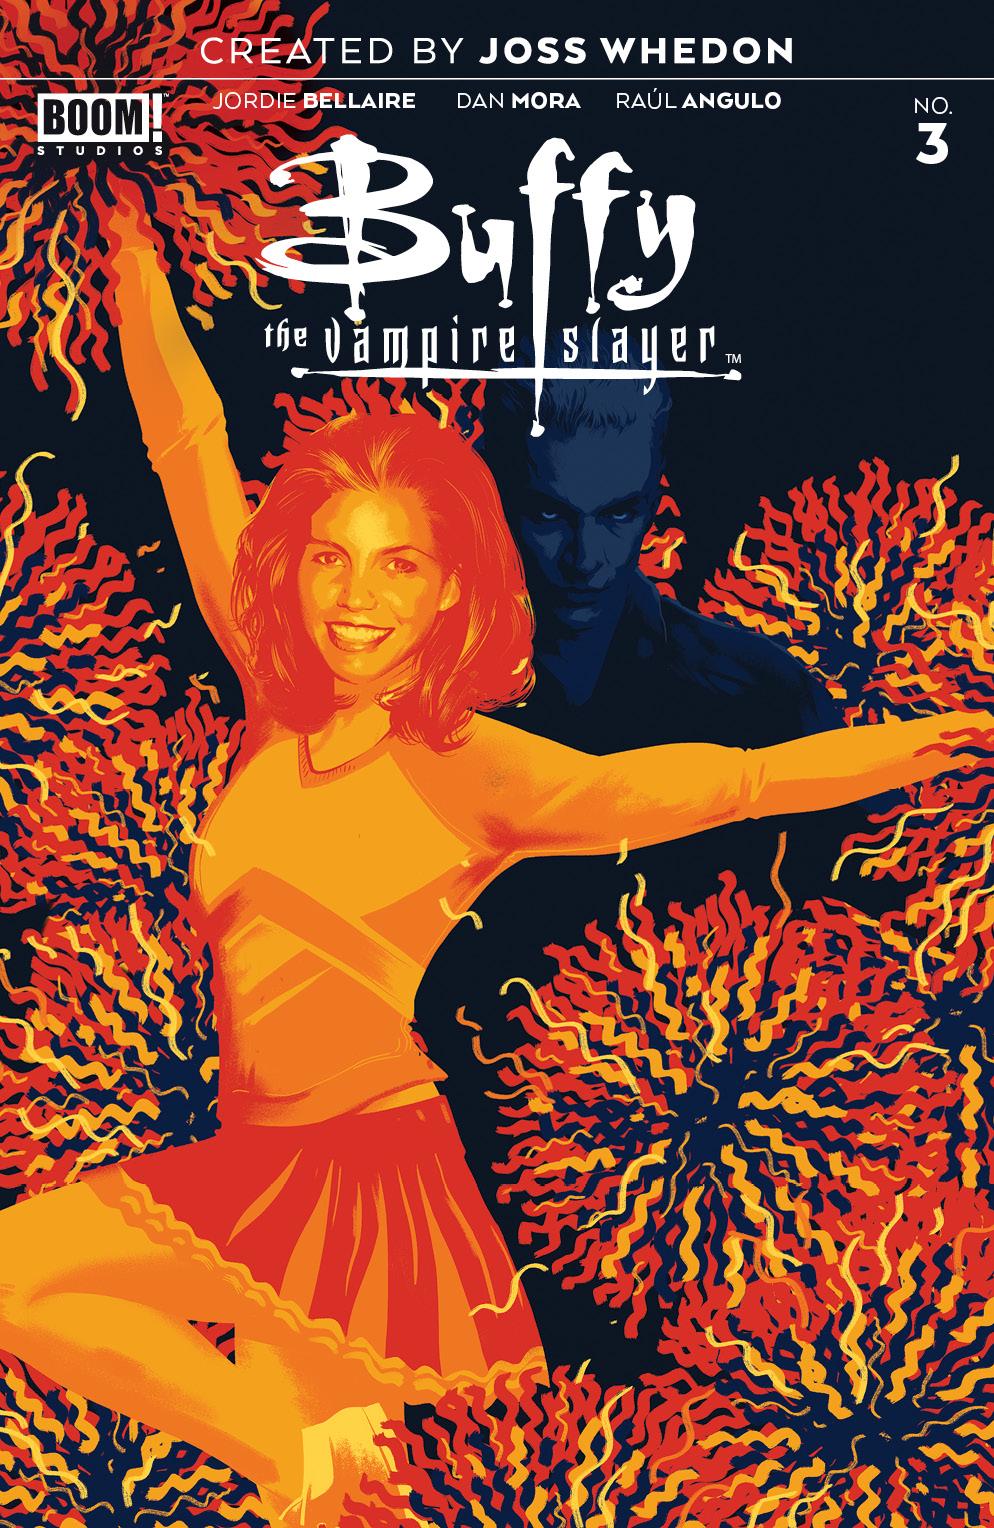 Buffy Vampire Slayer#3, BOOM! Studios